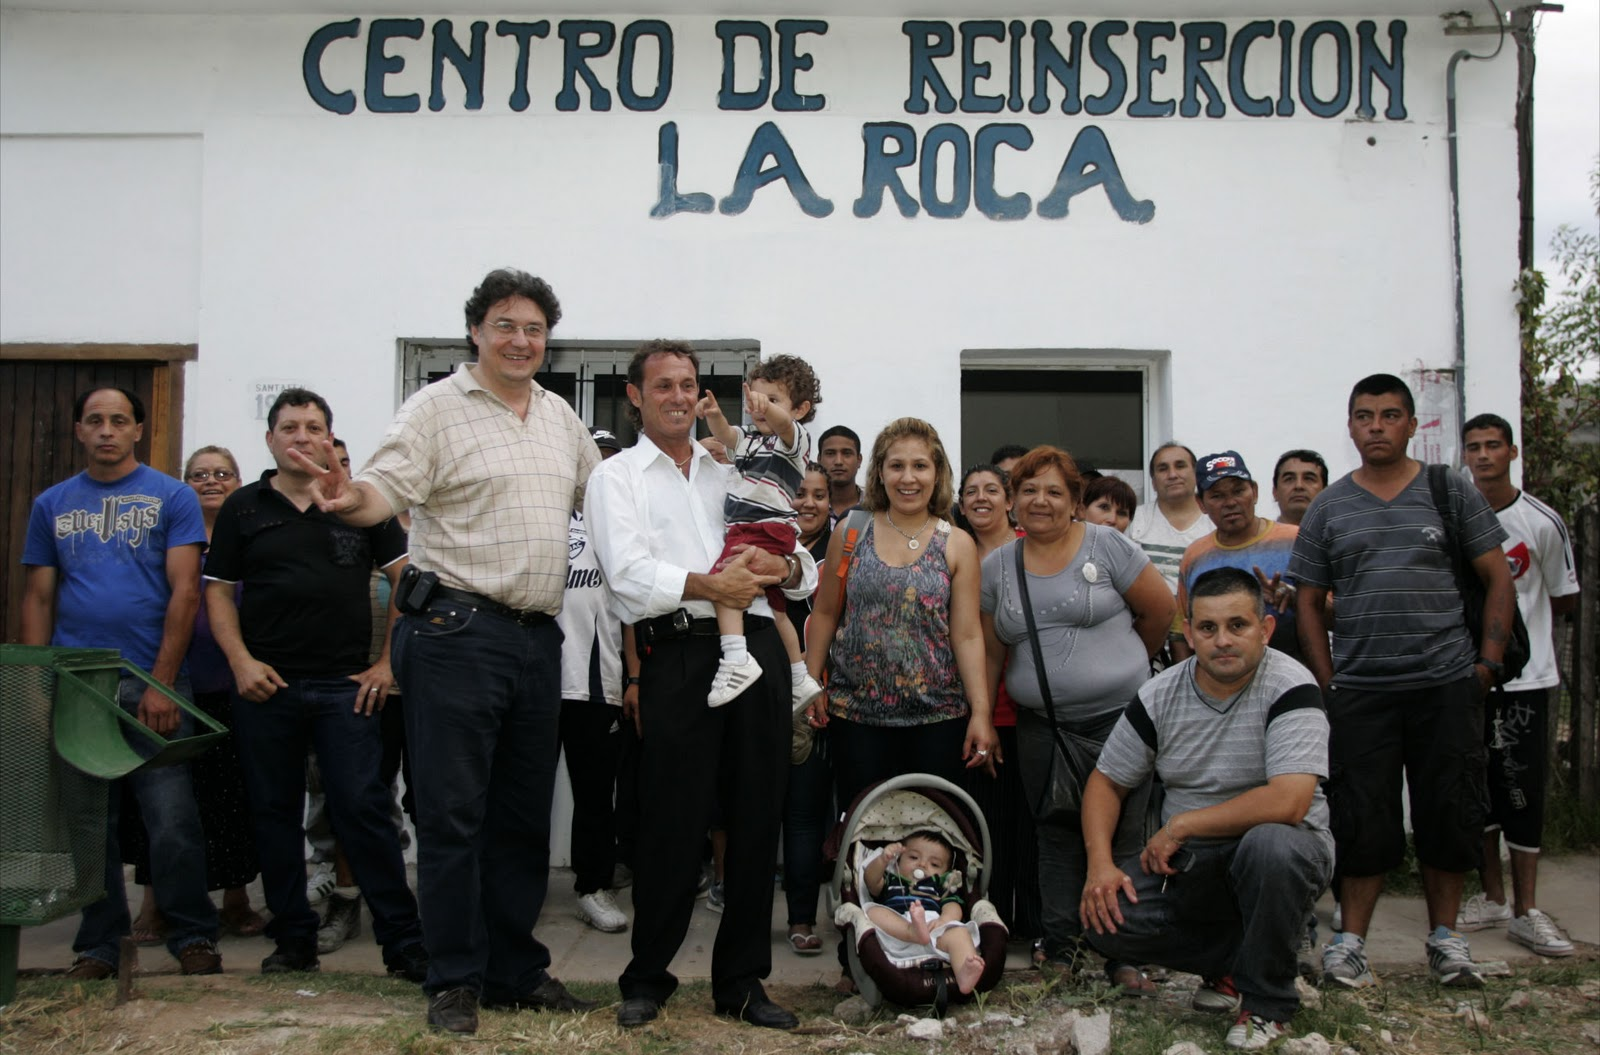 Quilmes digit l 2 aniversario del centro de reinserci n for Centro la roca